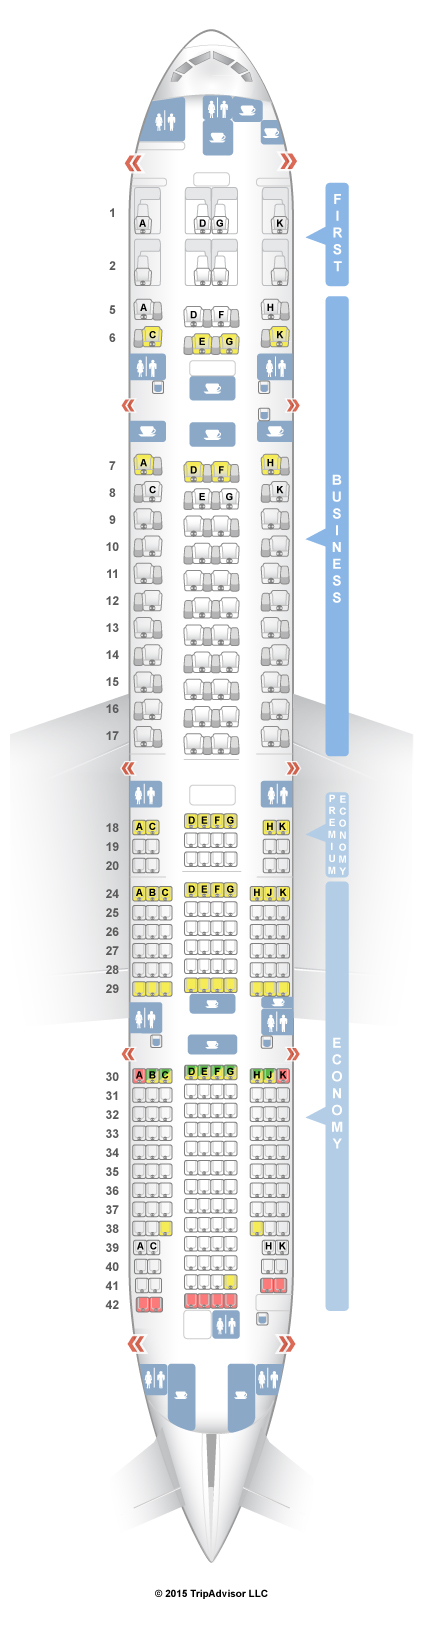 Seating plan boeing 777 300er qatar for Plan cabine 777 300er